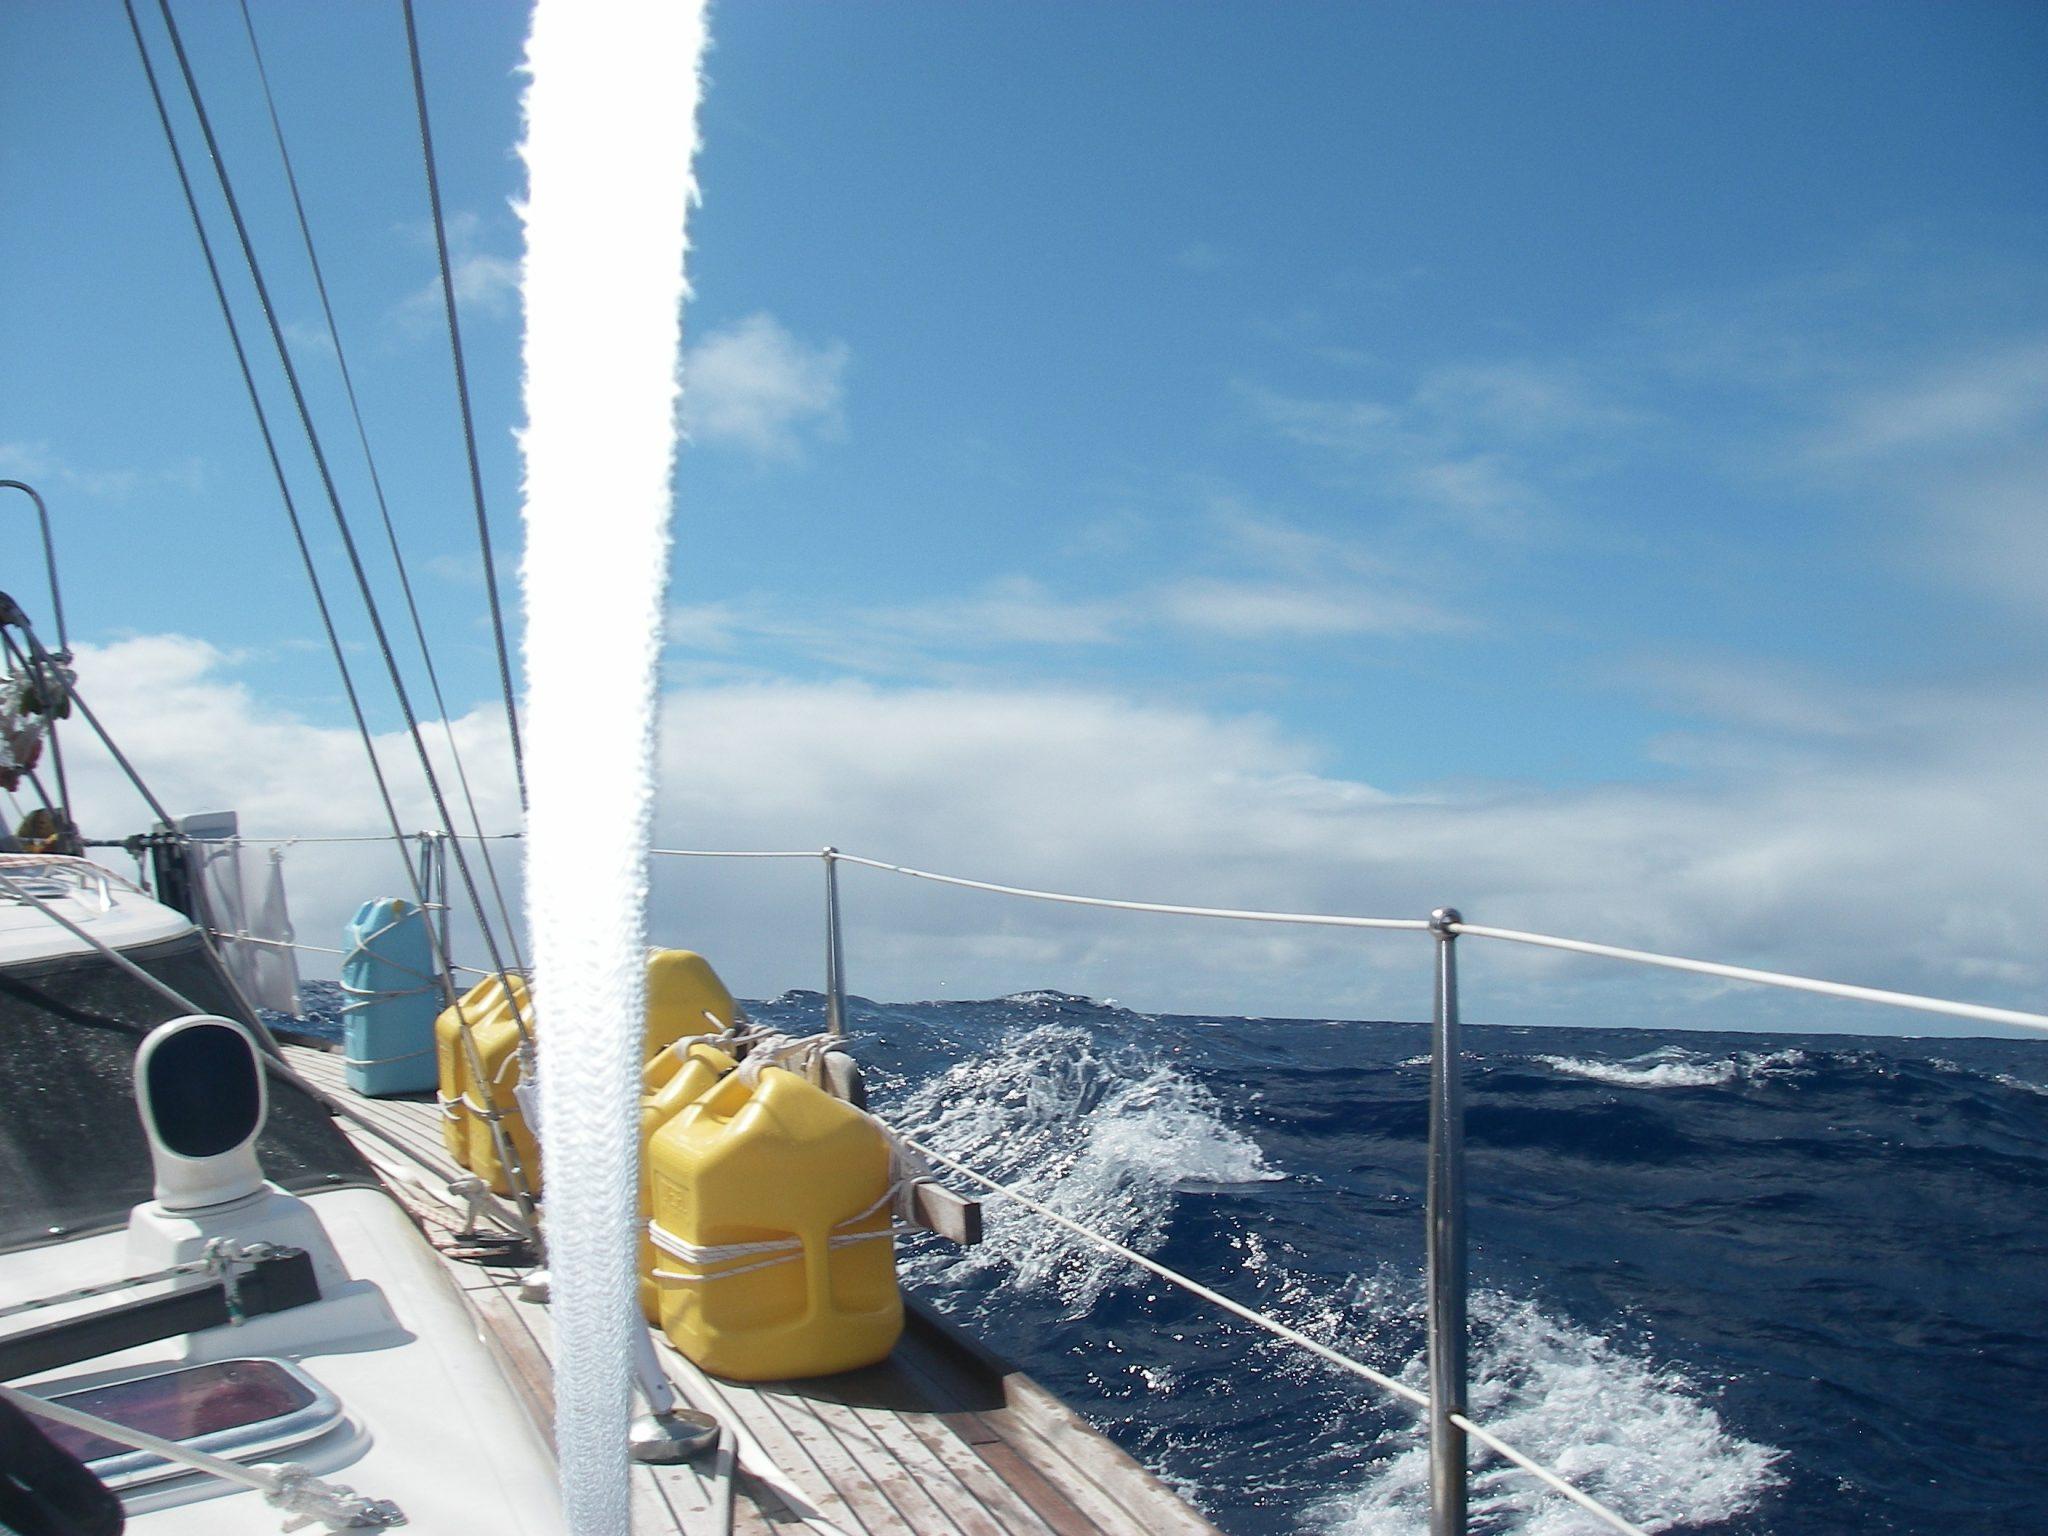 45. Sometimes the sea splashed onto Joyful's decks